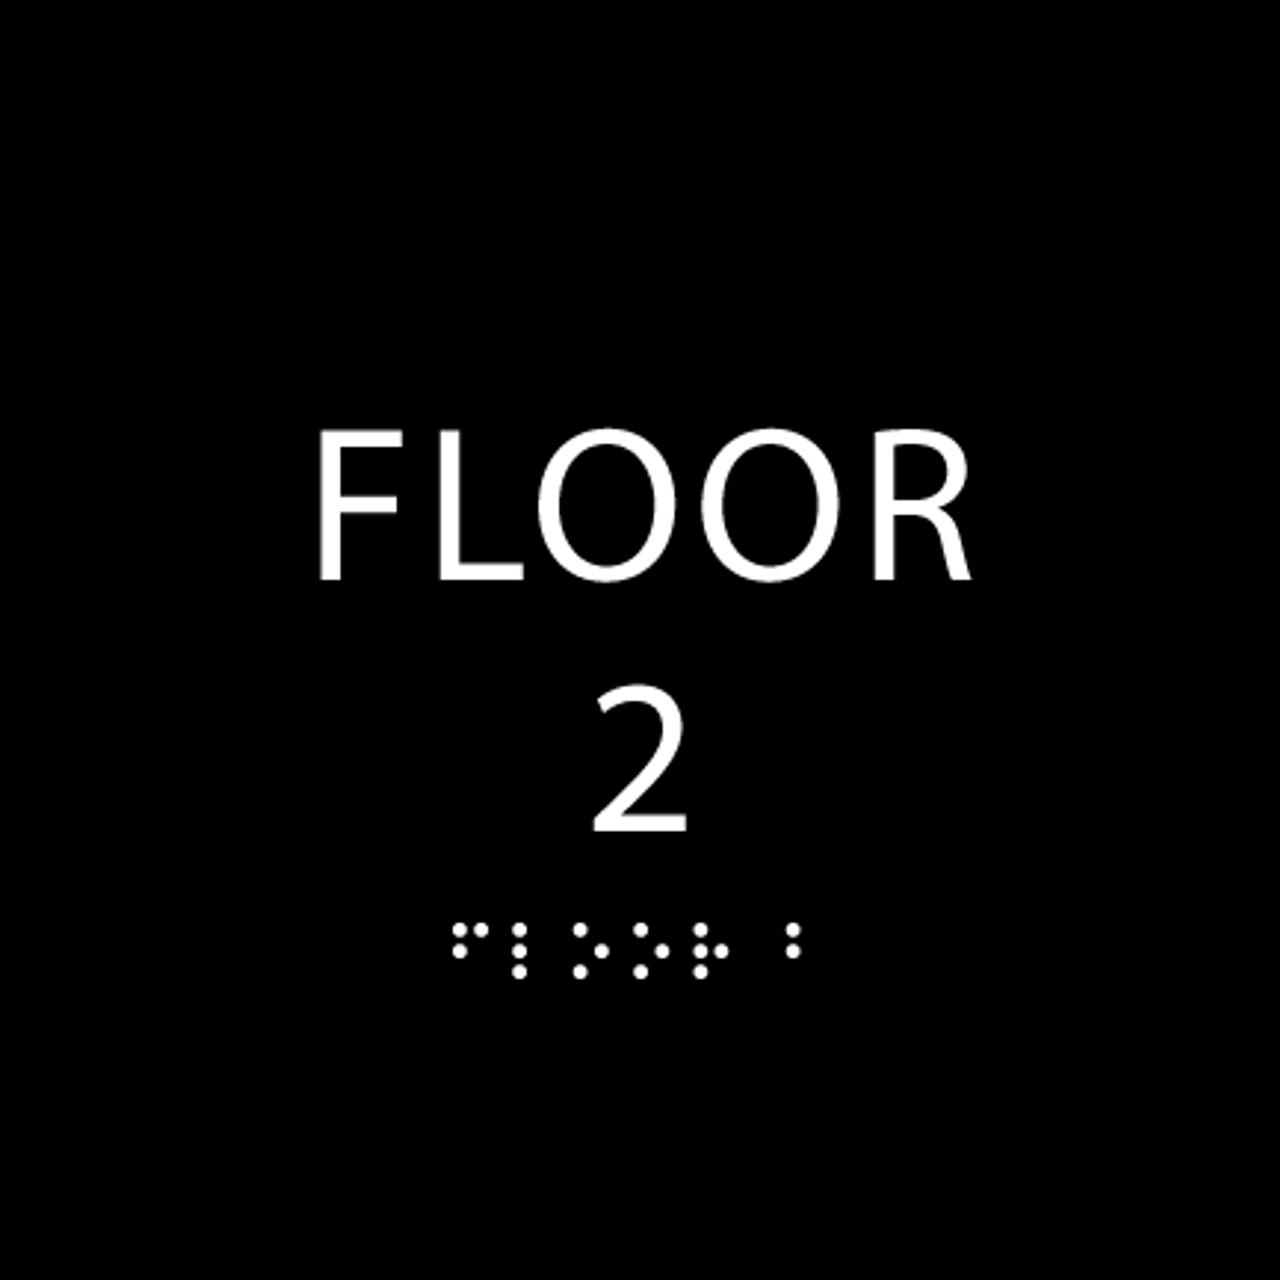 Black Floor 2 Identification Sign